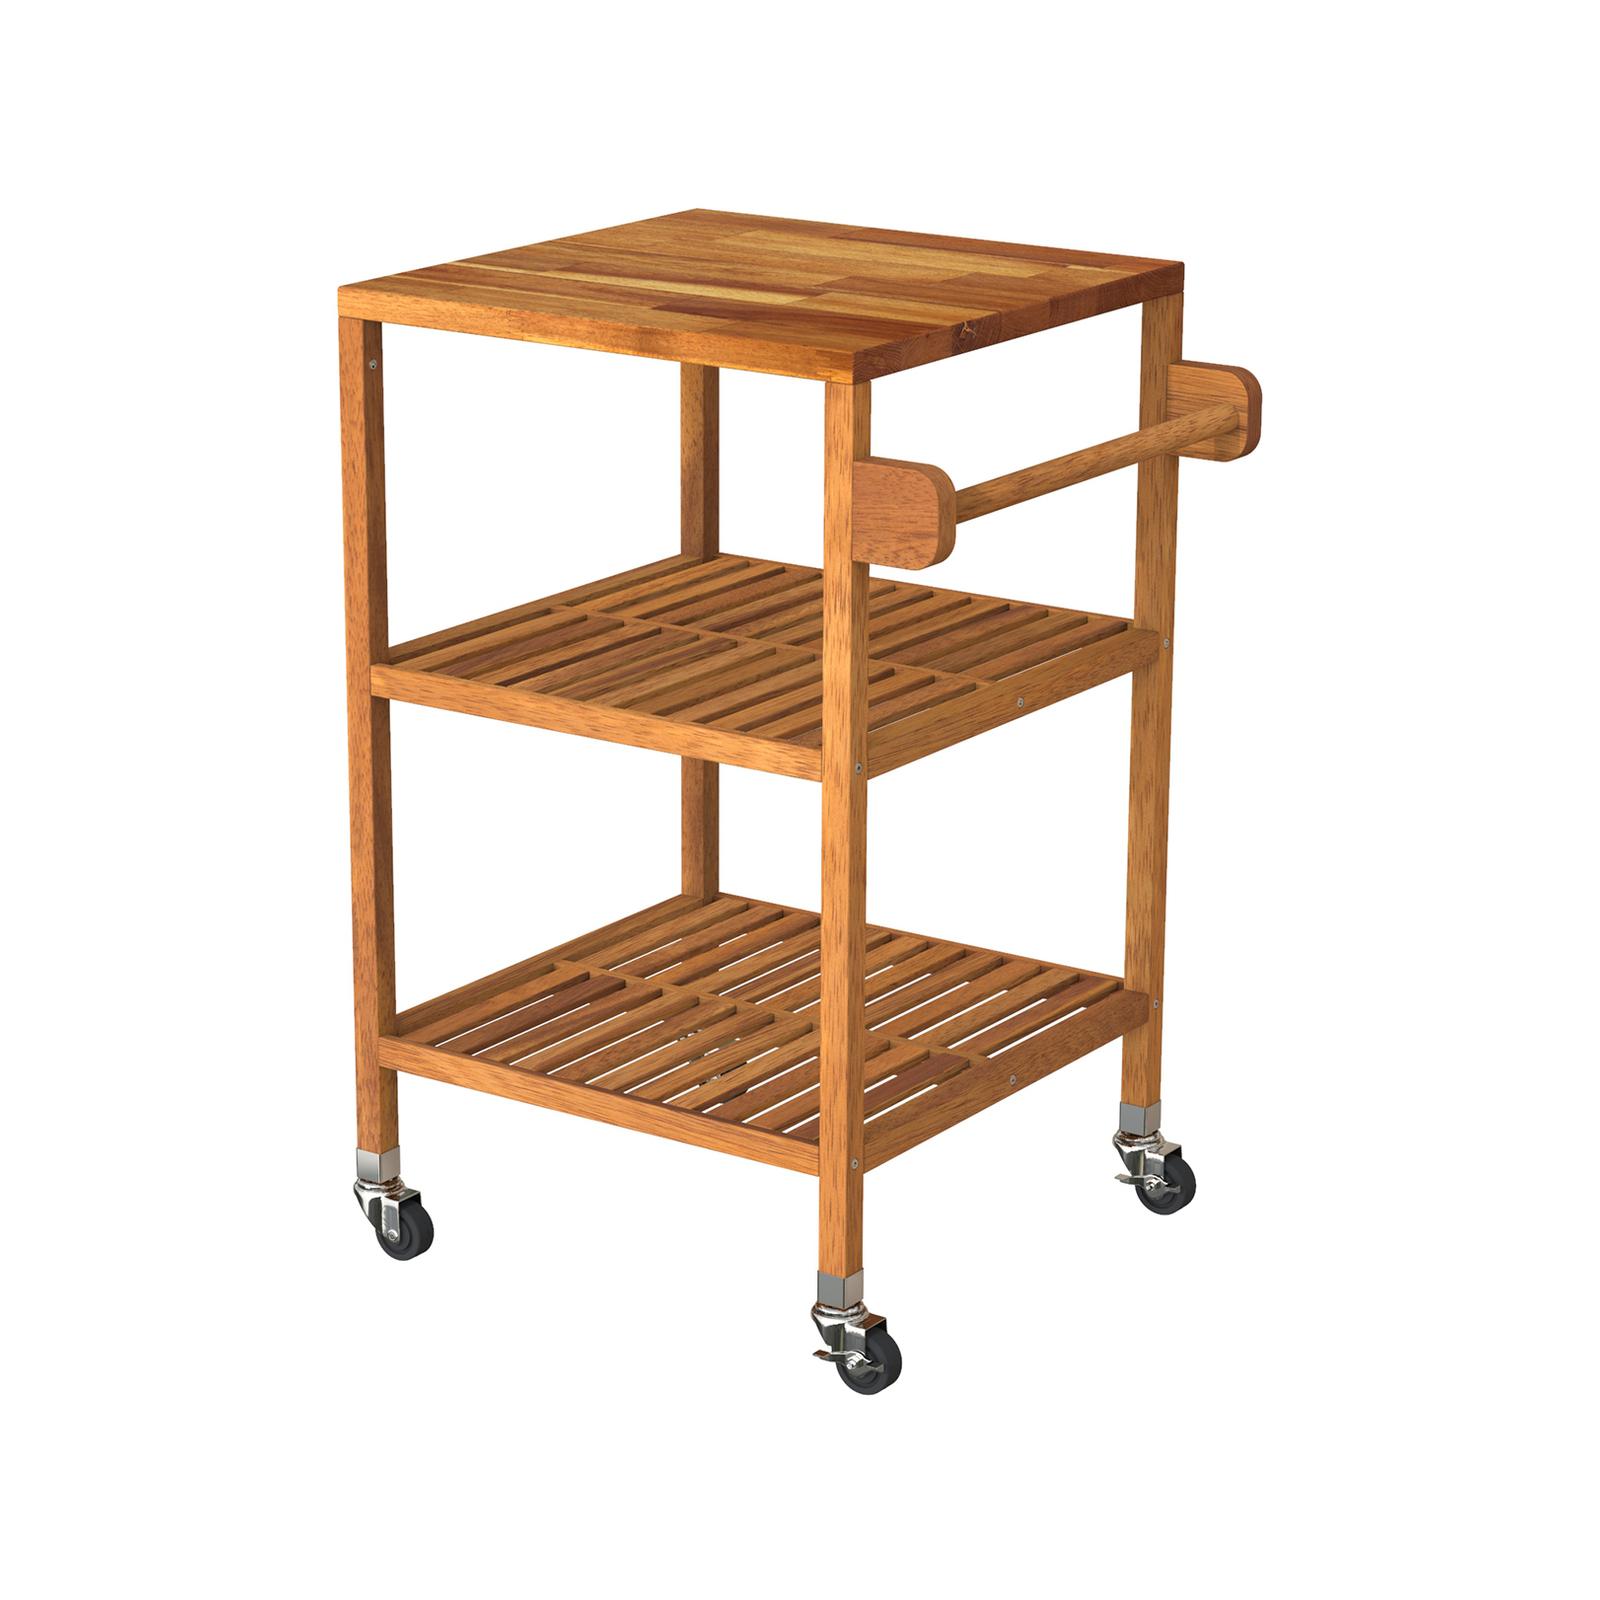 Interbuild 52 x 52 x 85cm Golden Teak Holger Quattro Kitchen Cart